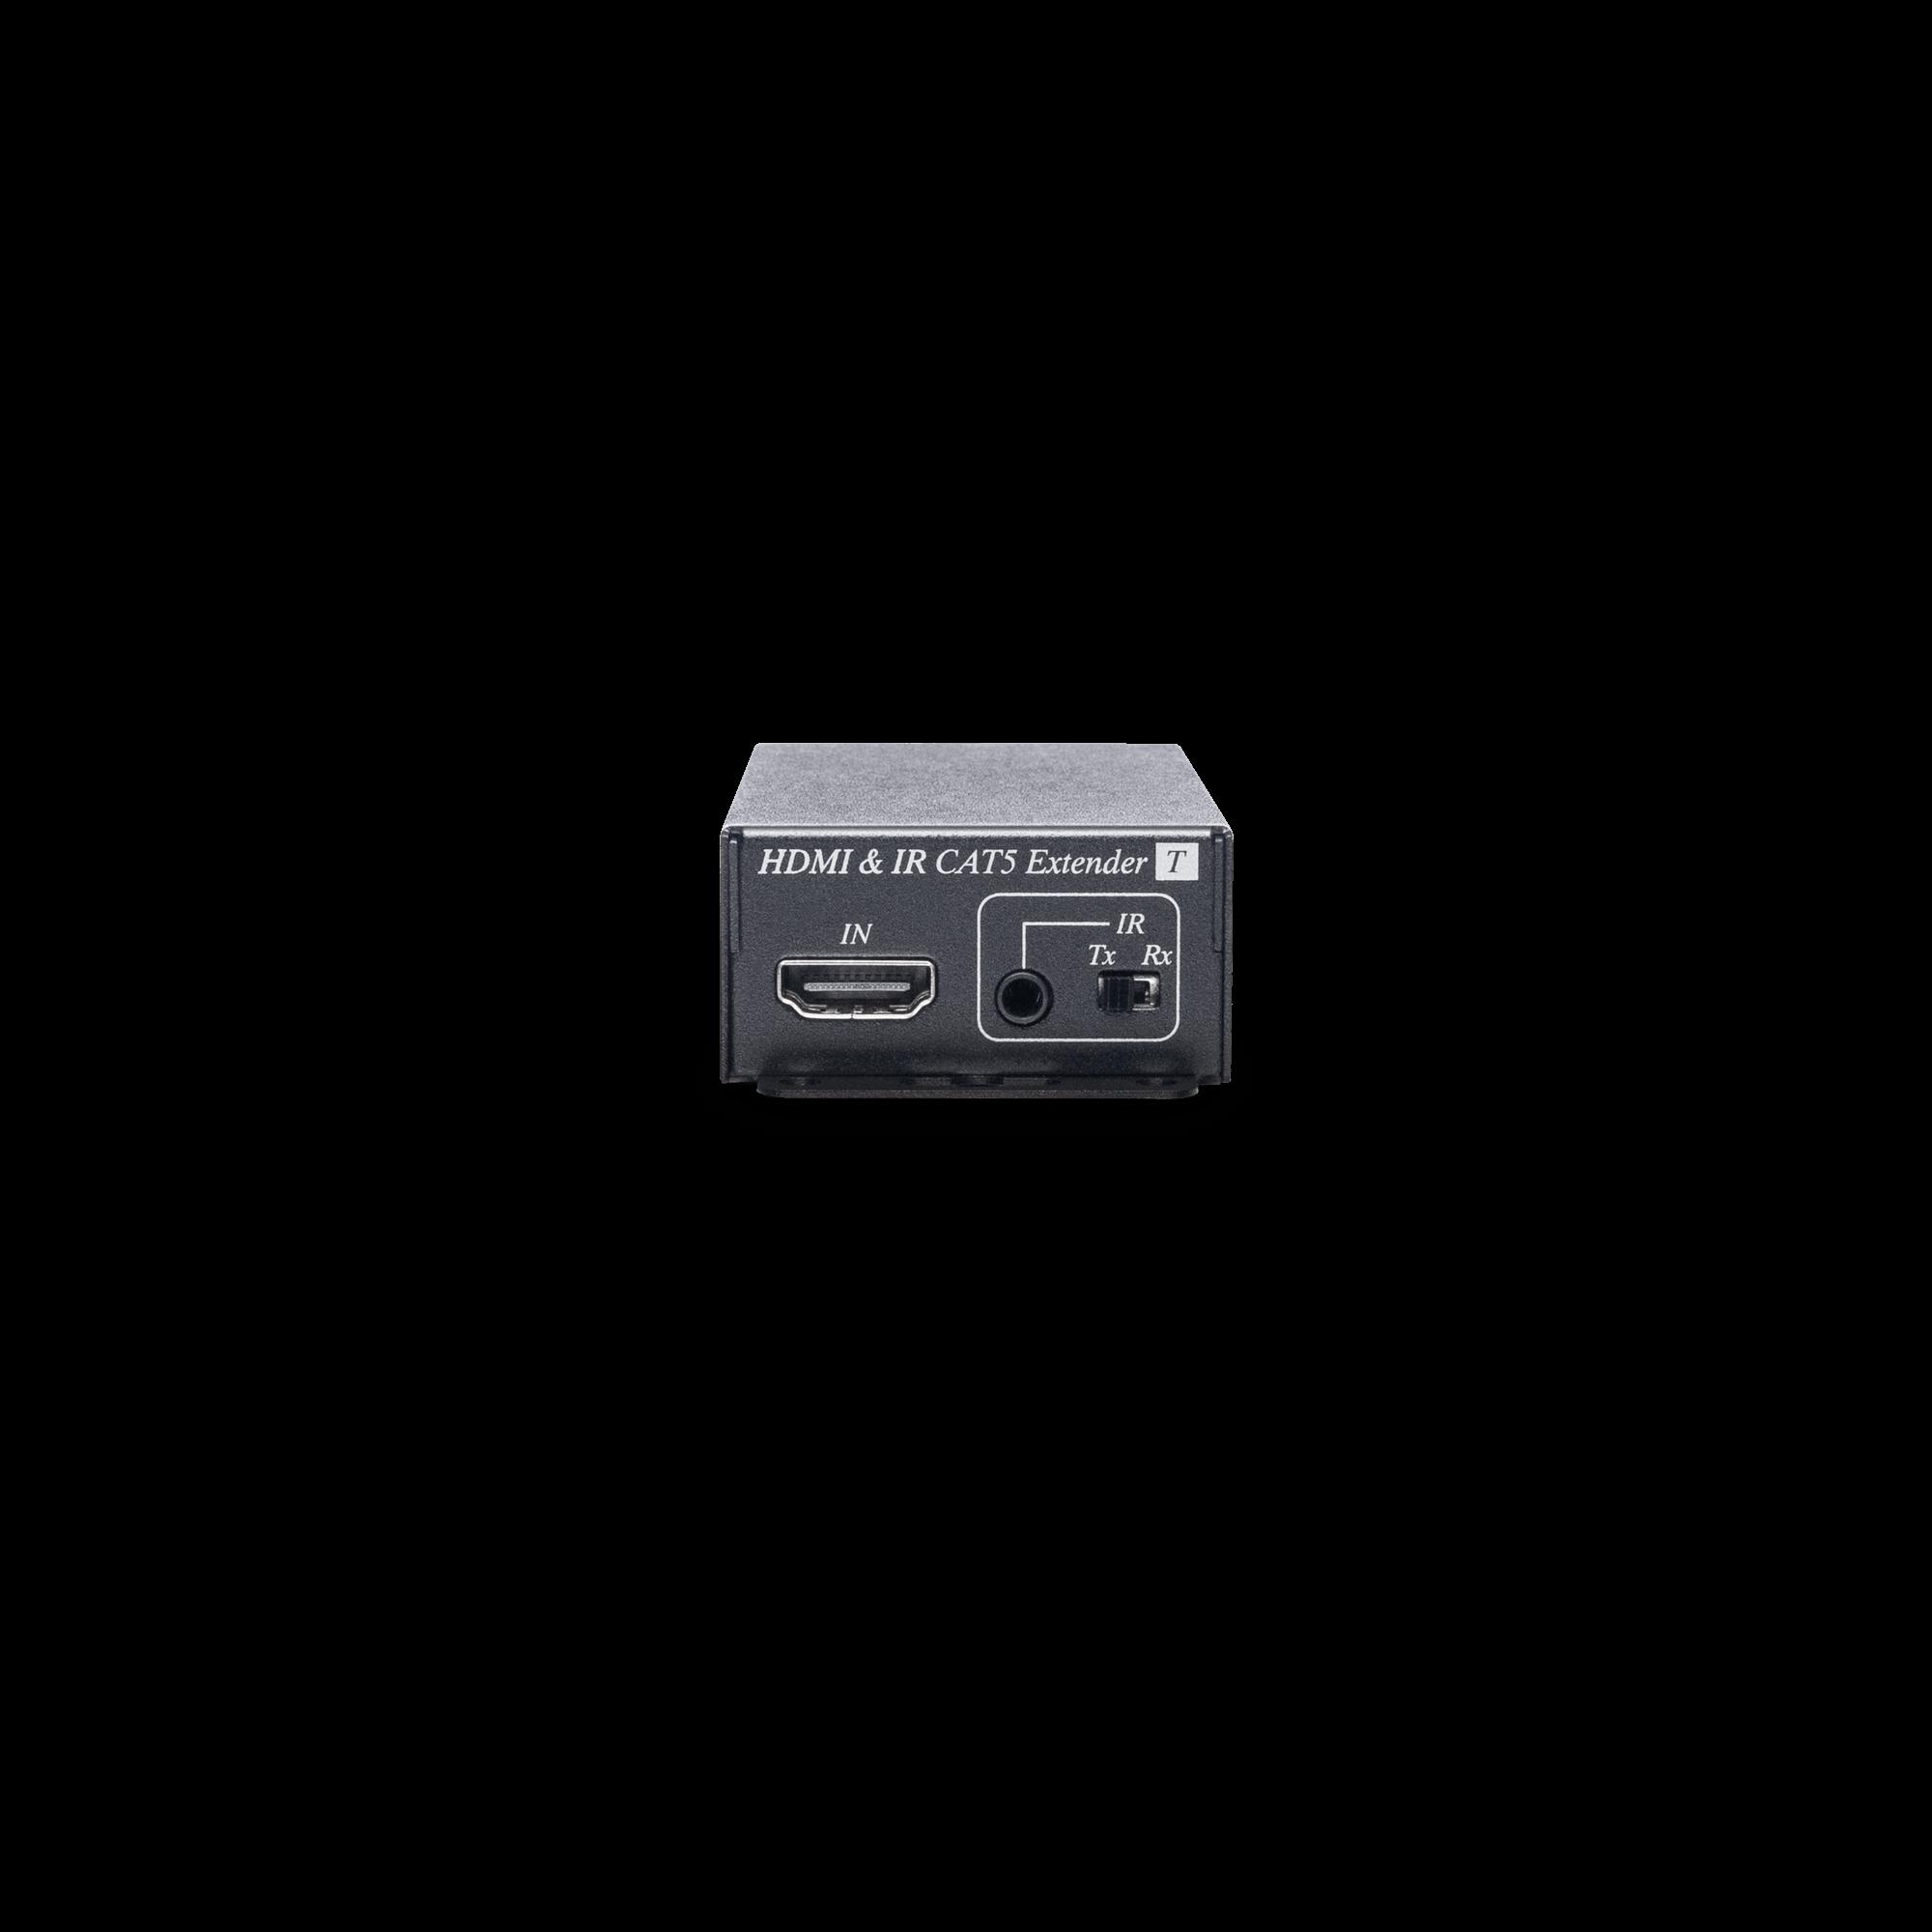 4K HDMI & IR CAT5e Extender 70M